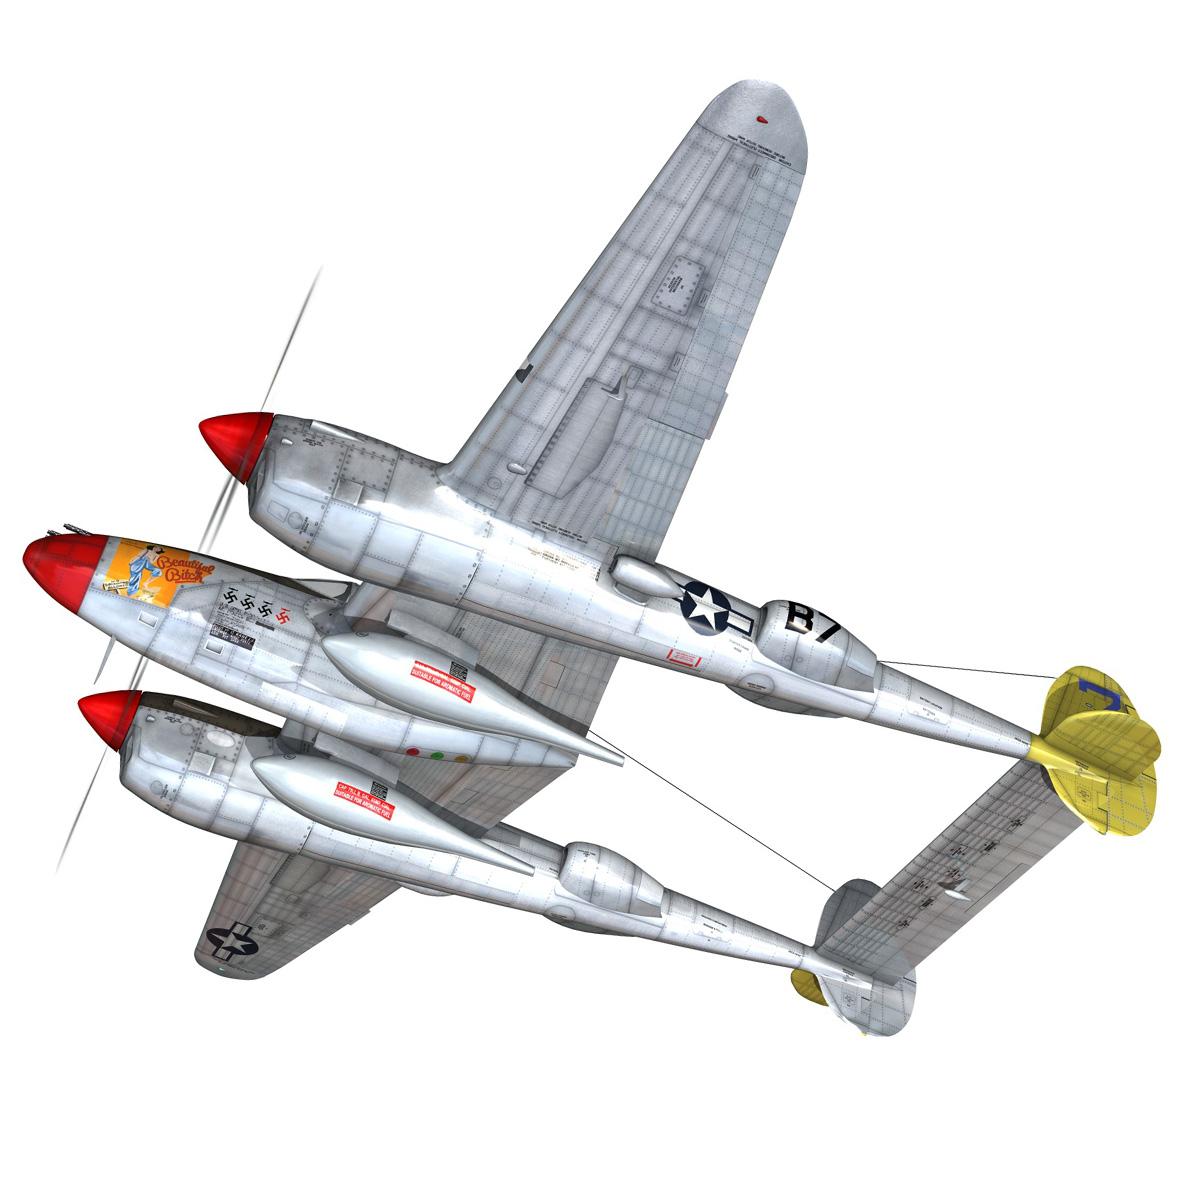 lockheed p-38 lightning – beautiful bitch 3d model fbx c4d lwo obj 272666